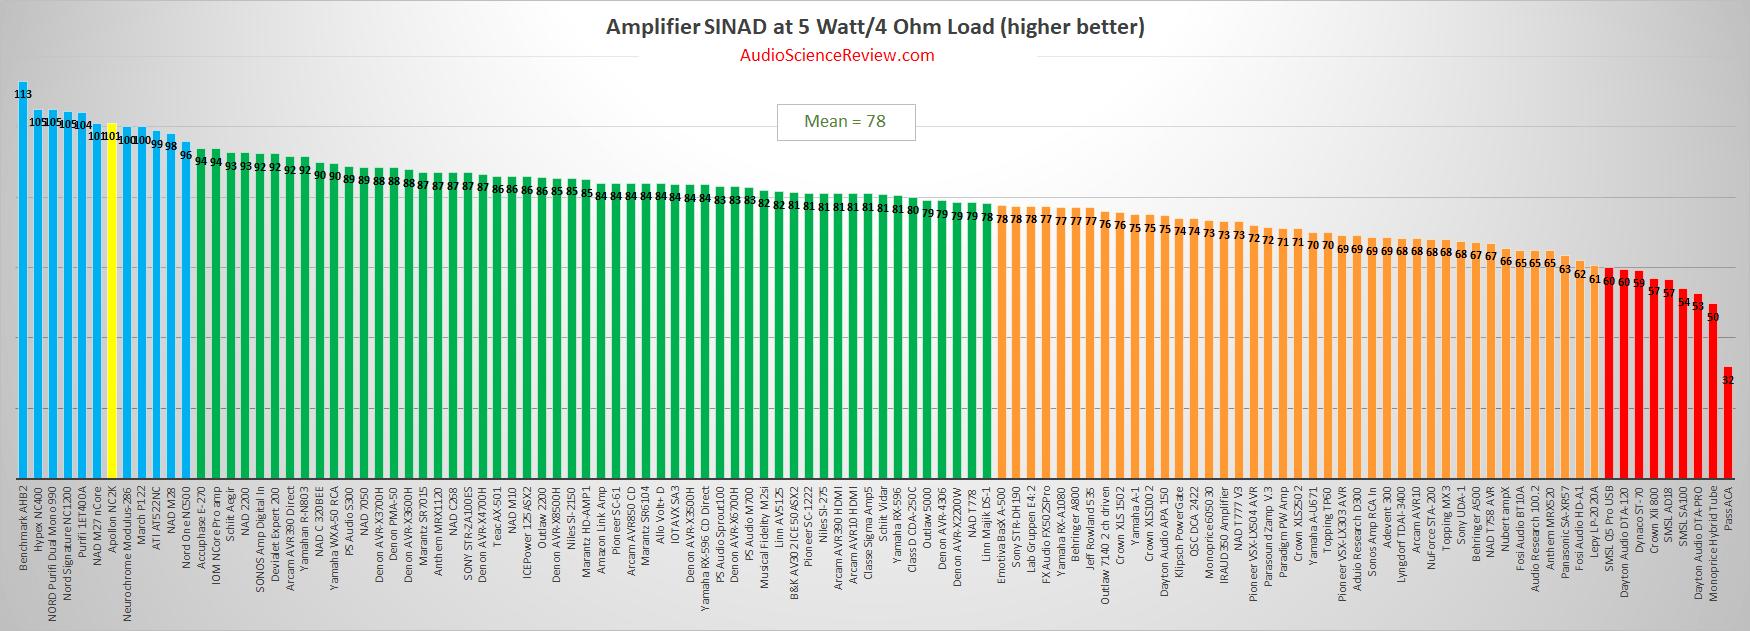 Best monoblock amplifier review 2020.png